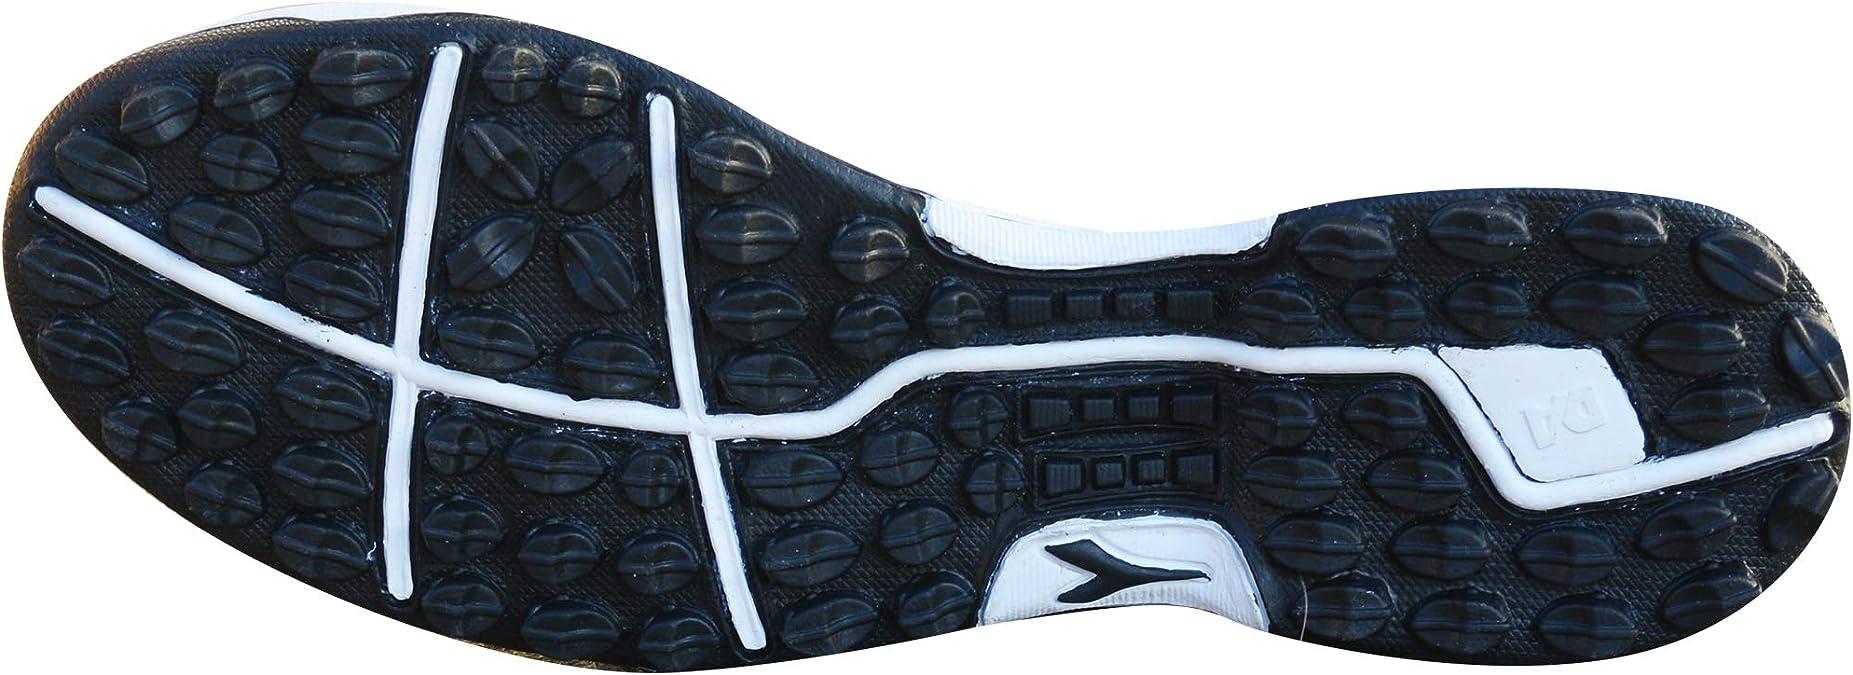 Diadora Womens Capitano TF Turf Soccer Shoes (7 Wide, Columbia ...